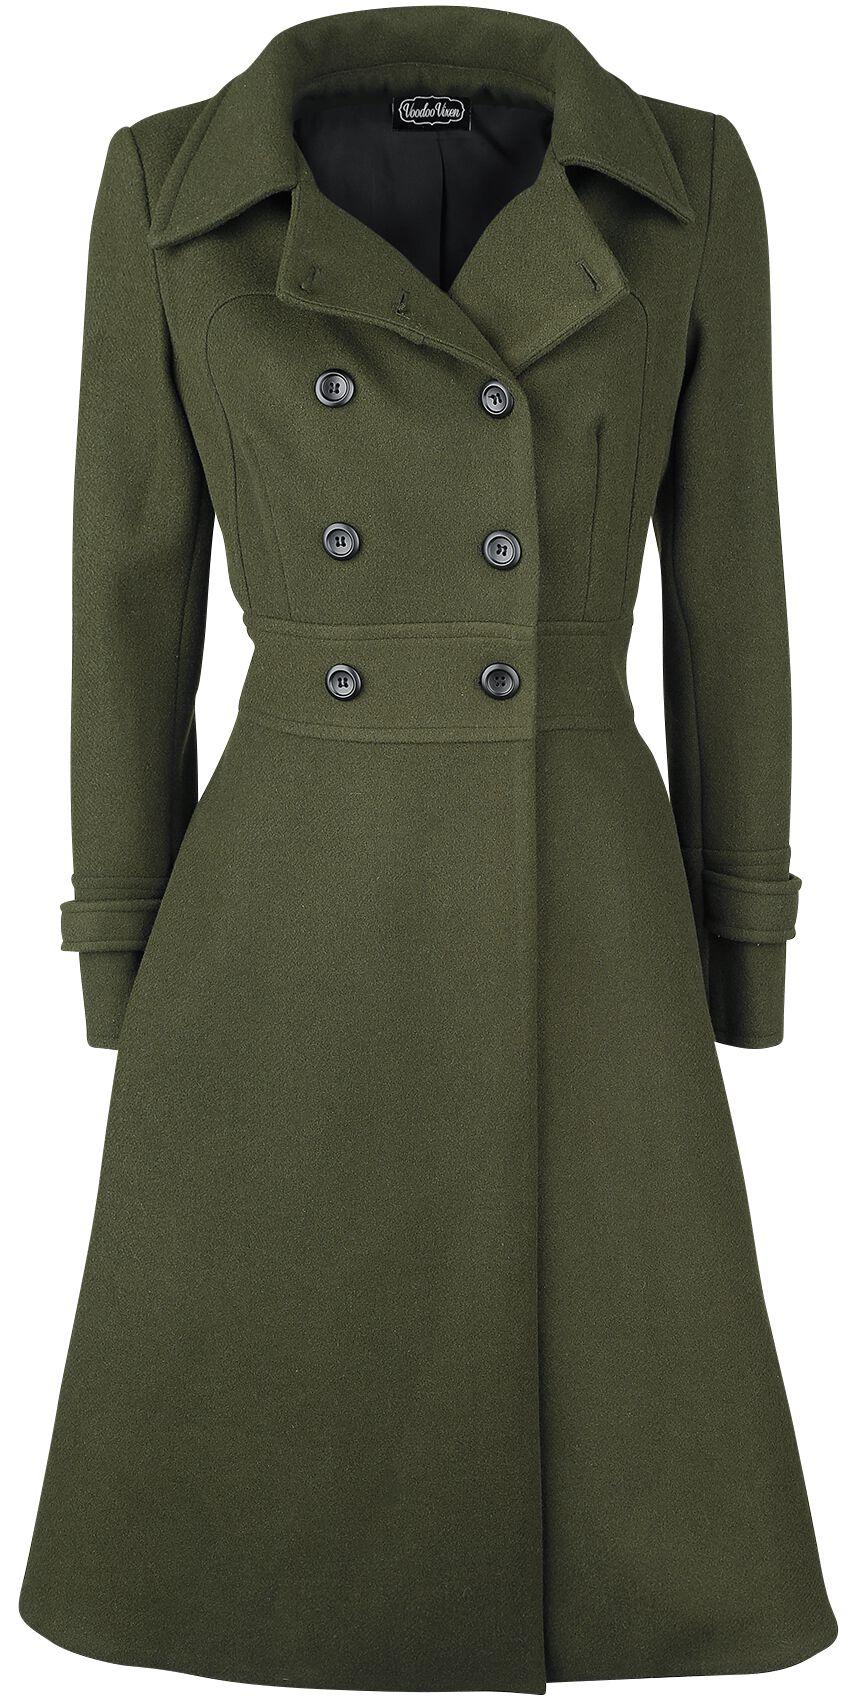 Jacken für Frauen - Voodoo Vixen Martha 40s Longline Coat Mantel khaki  - Onlineshop EMP